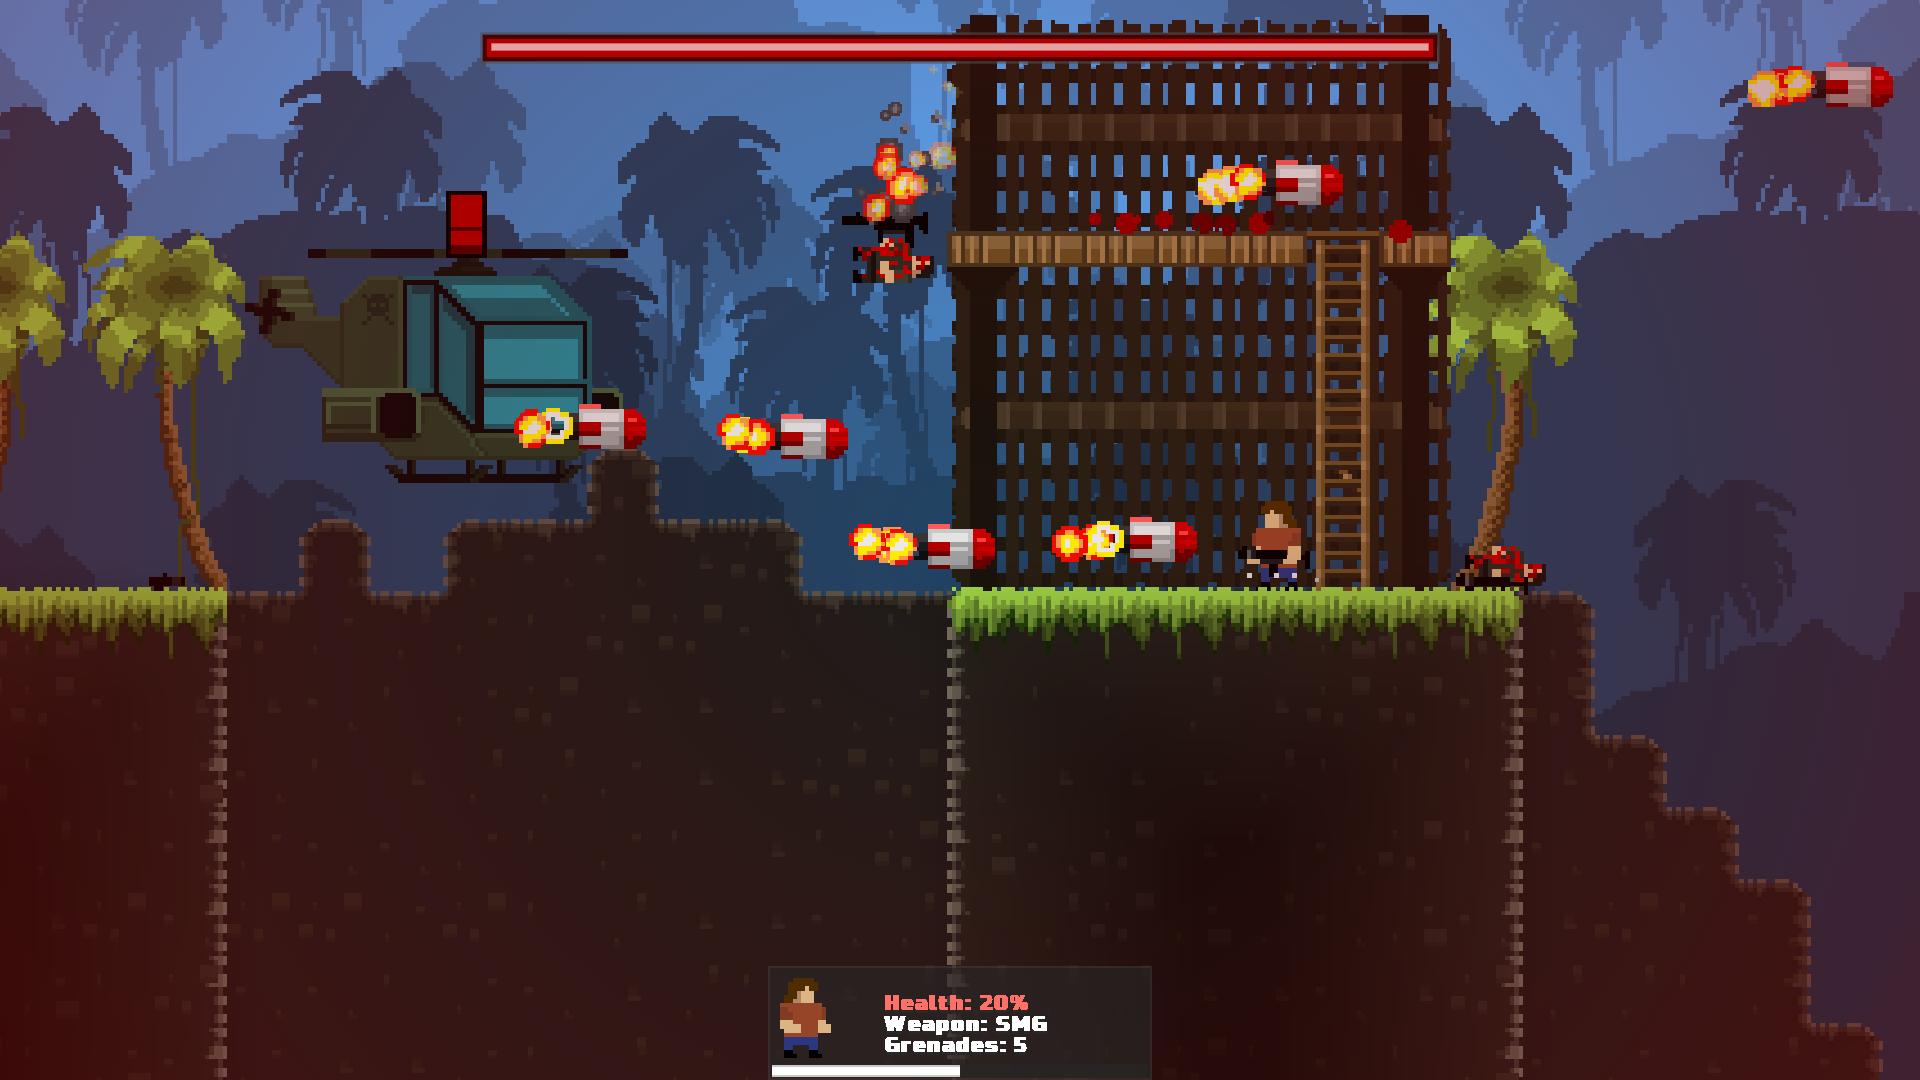 Boss Missiles